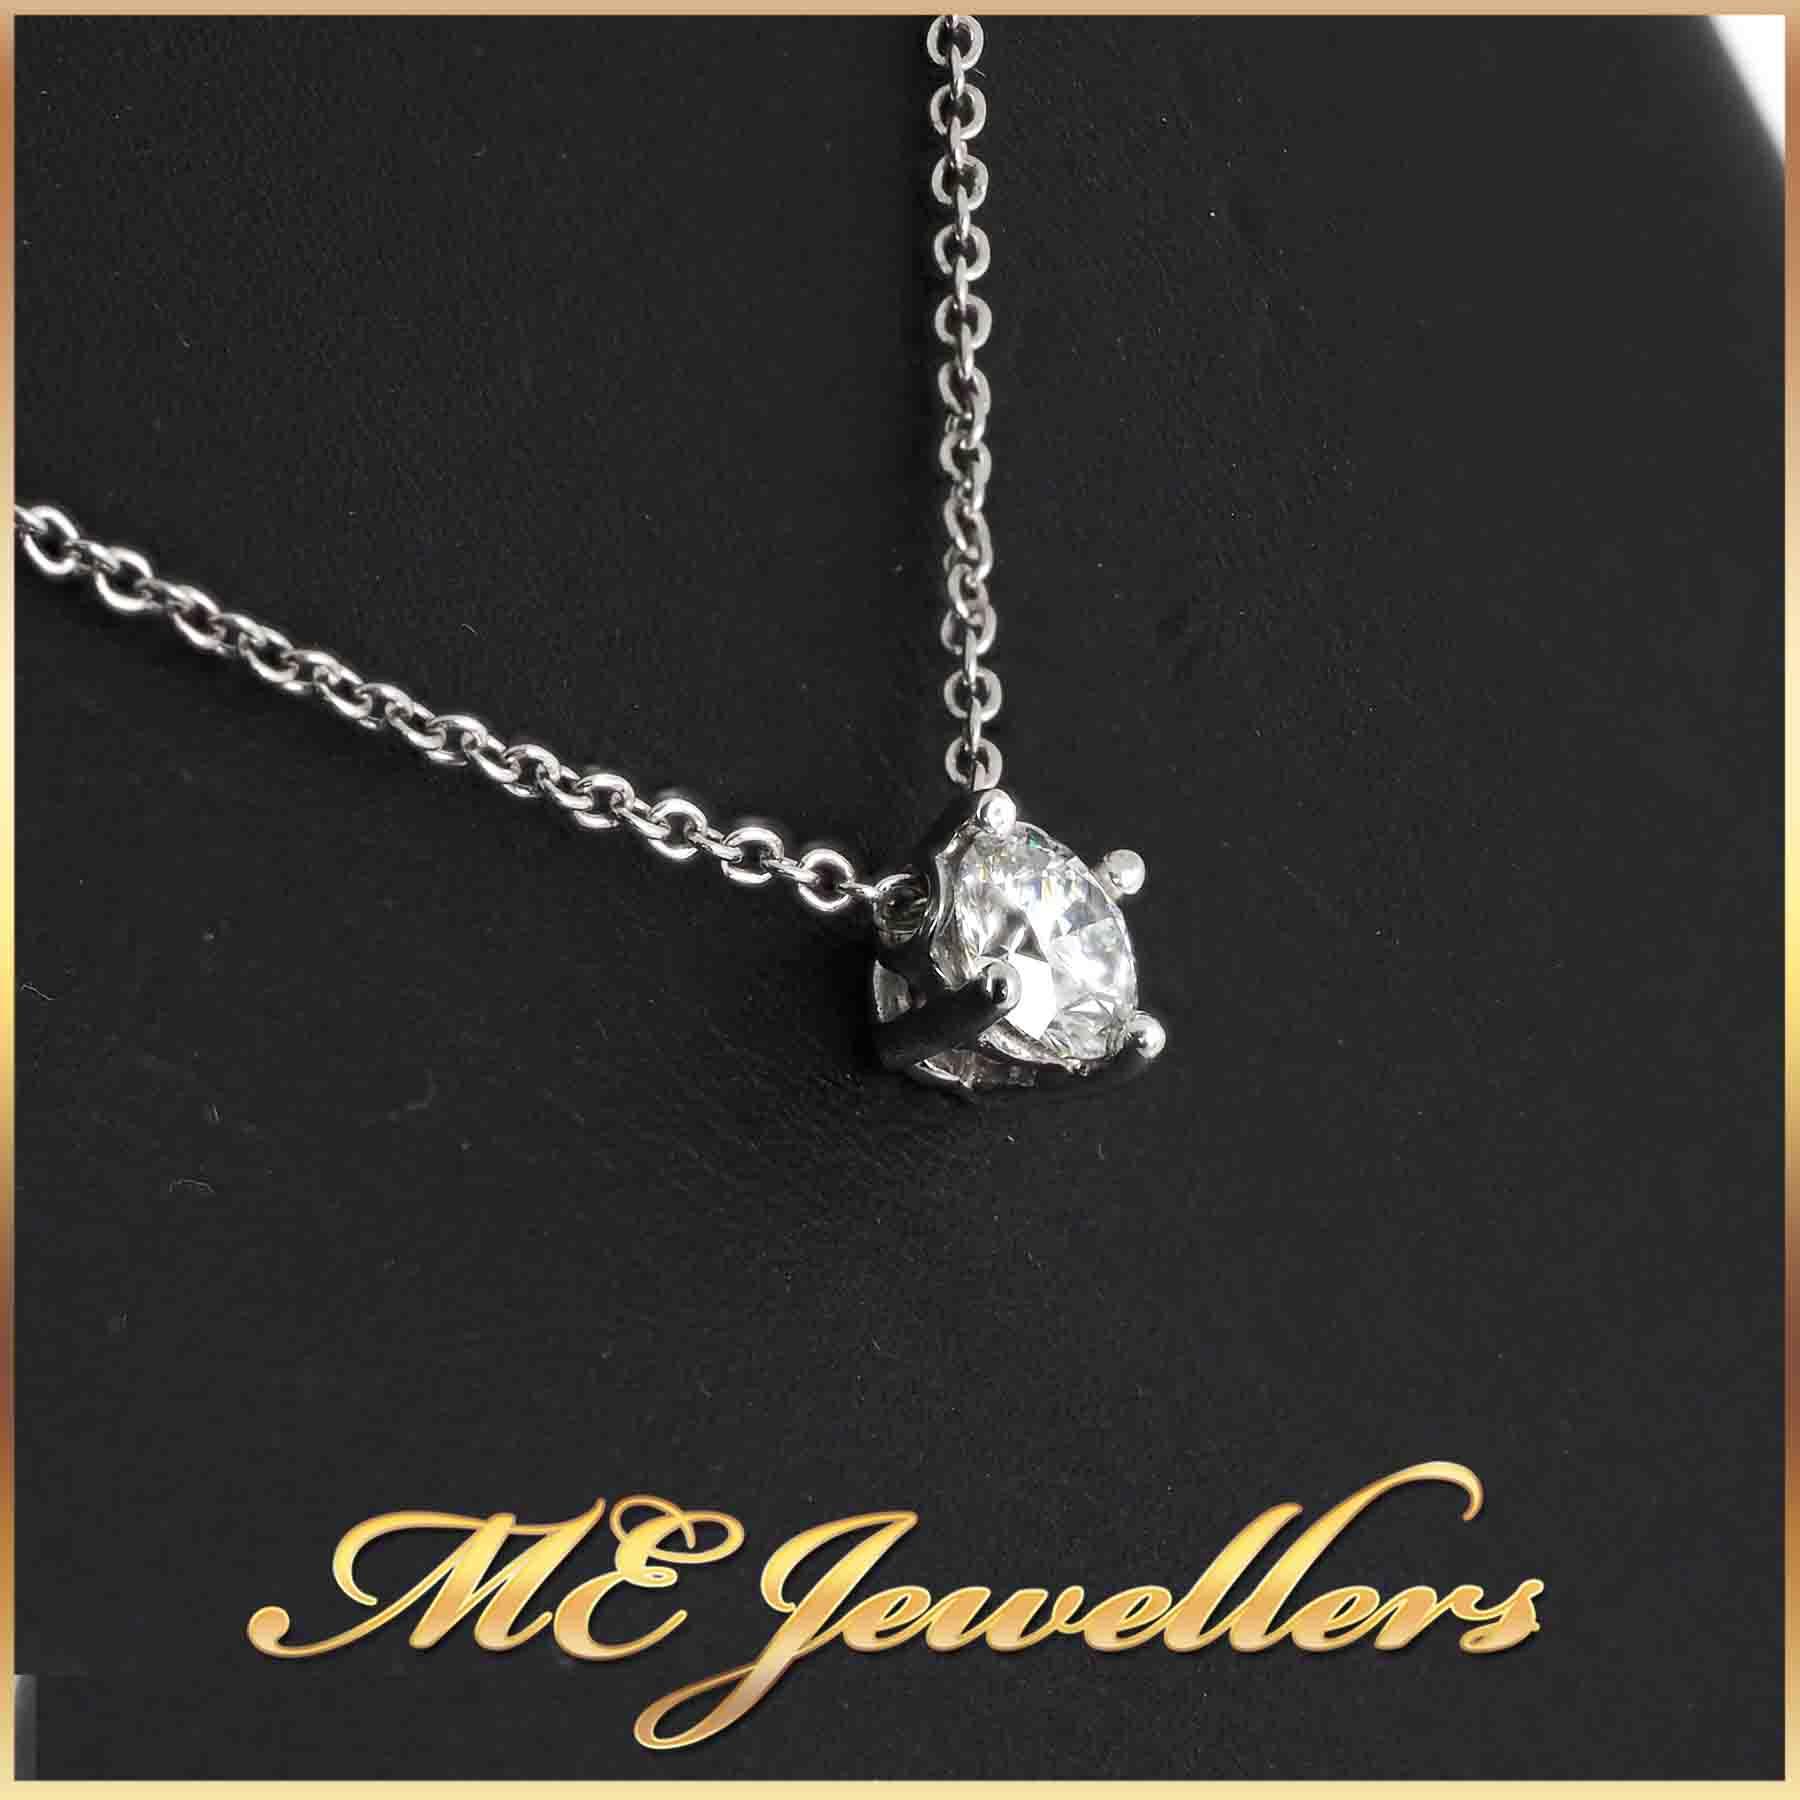 2498-Solitaire Diamond Pendant 0.70ct 18K White Gold 2